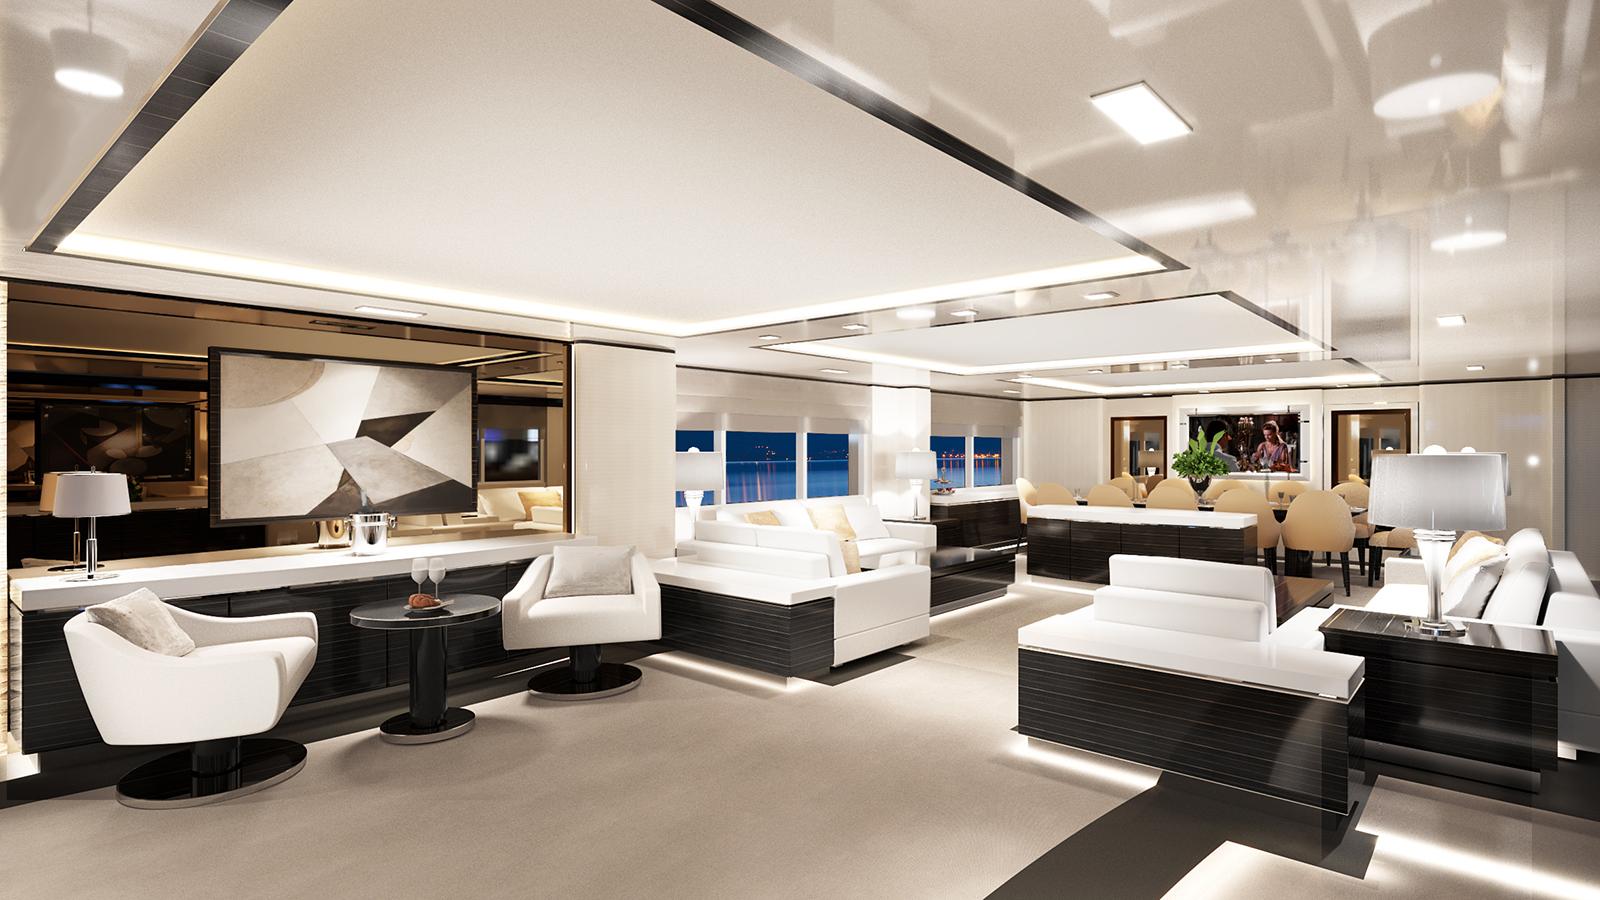 the-saloon-of-the-golden-yacht-superyacht-omathilde